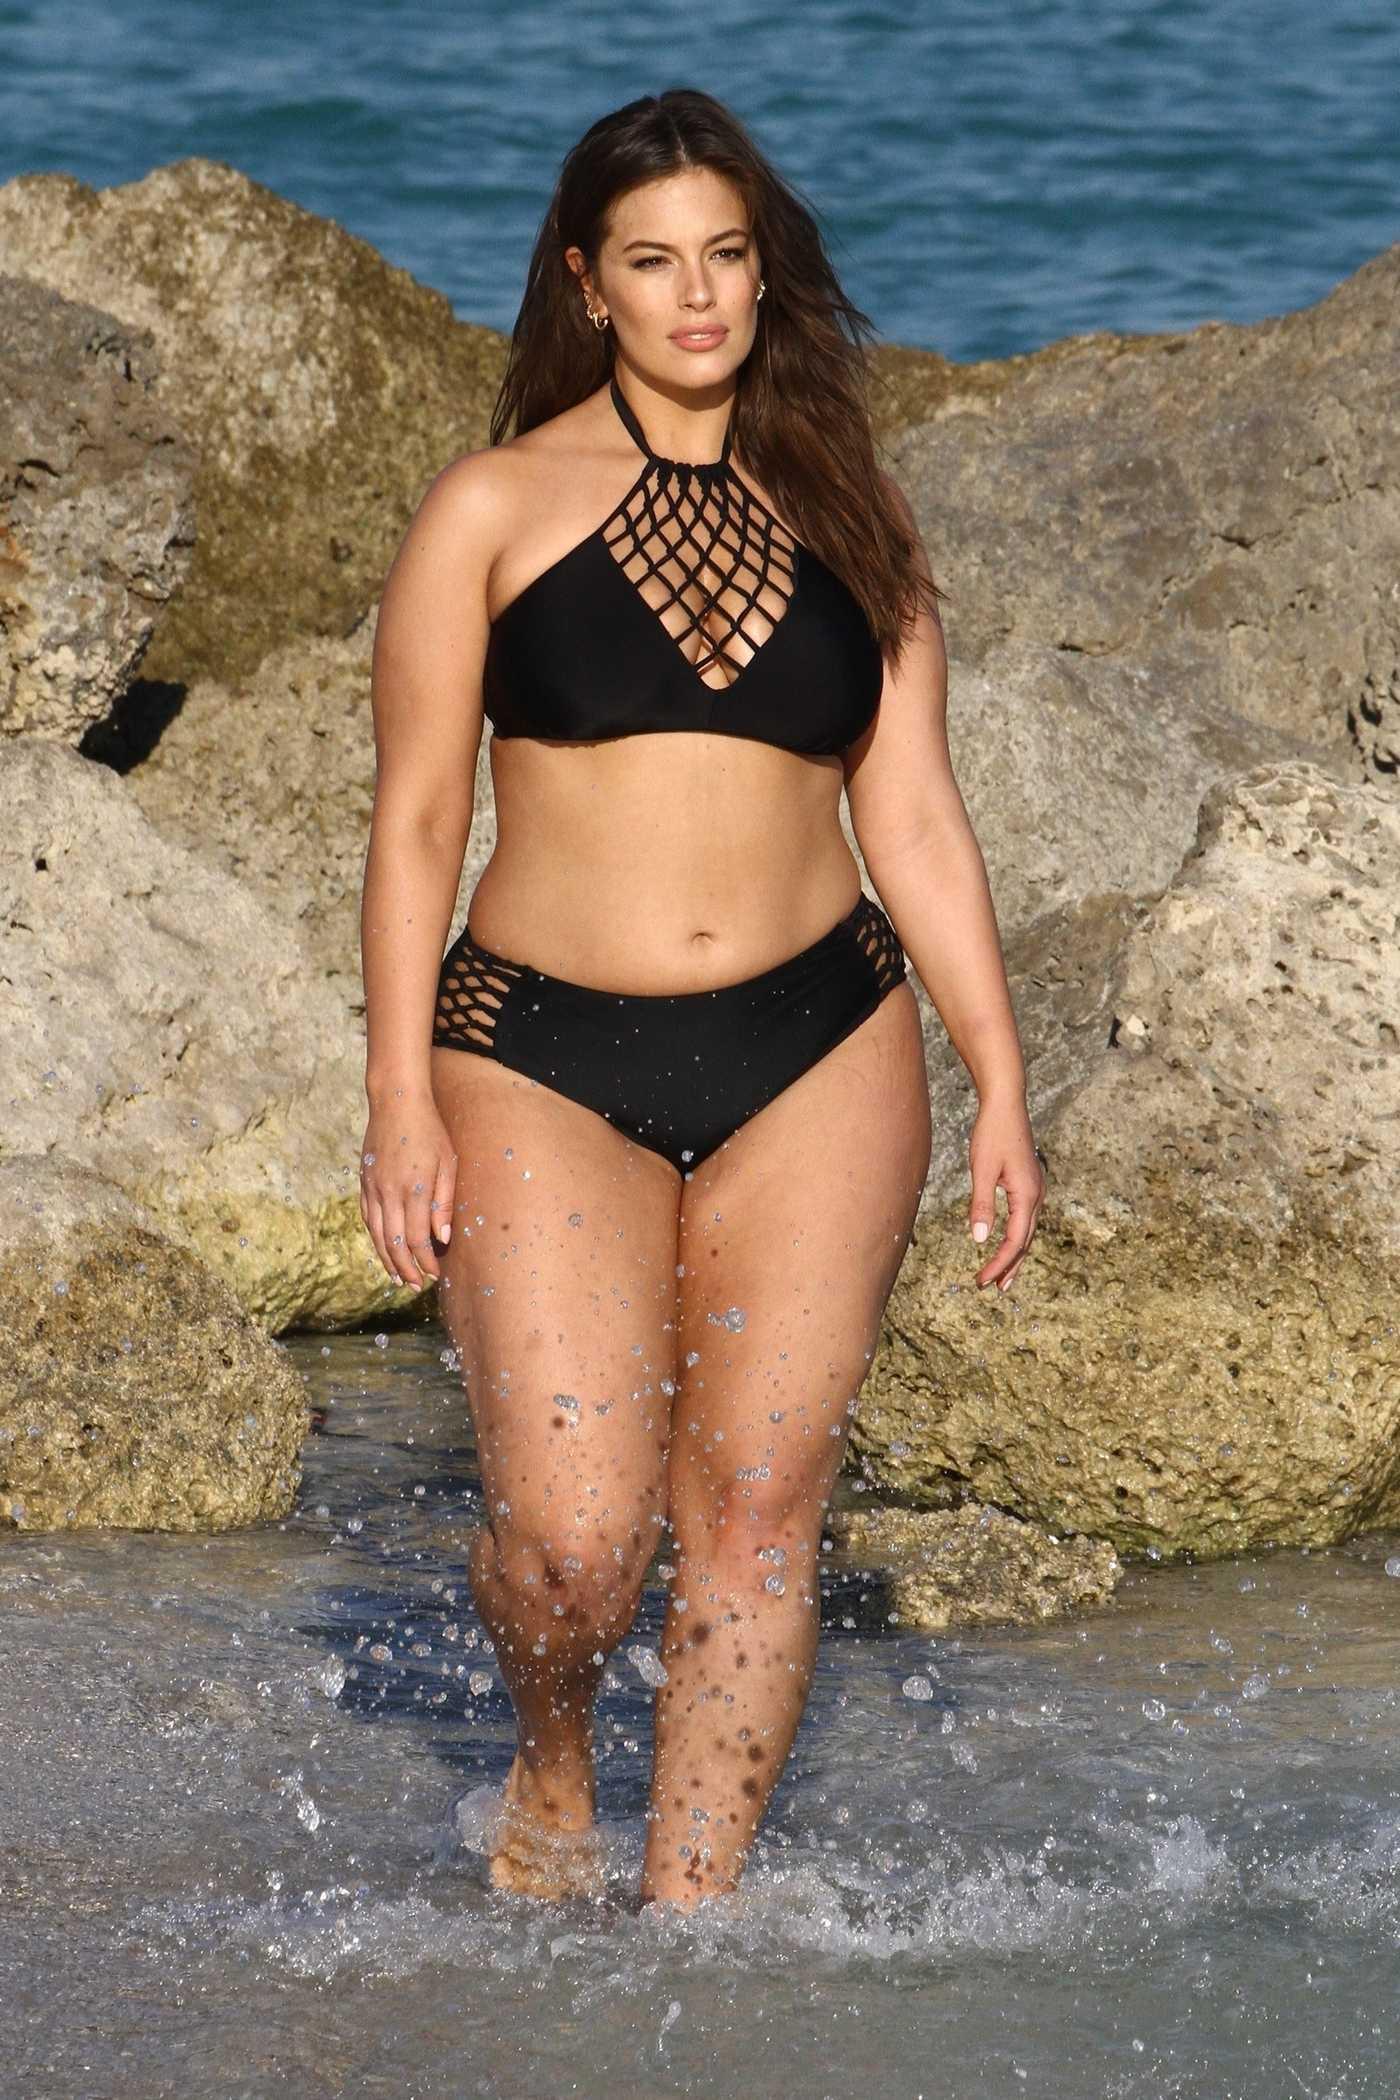 Ashley Graham Does a Bikini Photoshoot on the Beach in Miami 03/14/2018